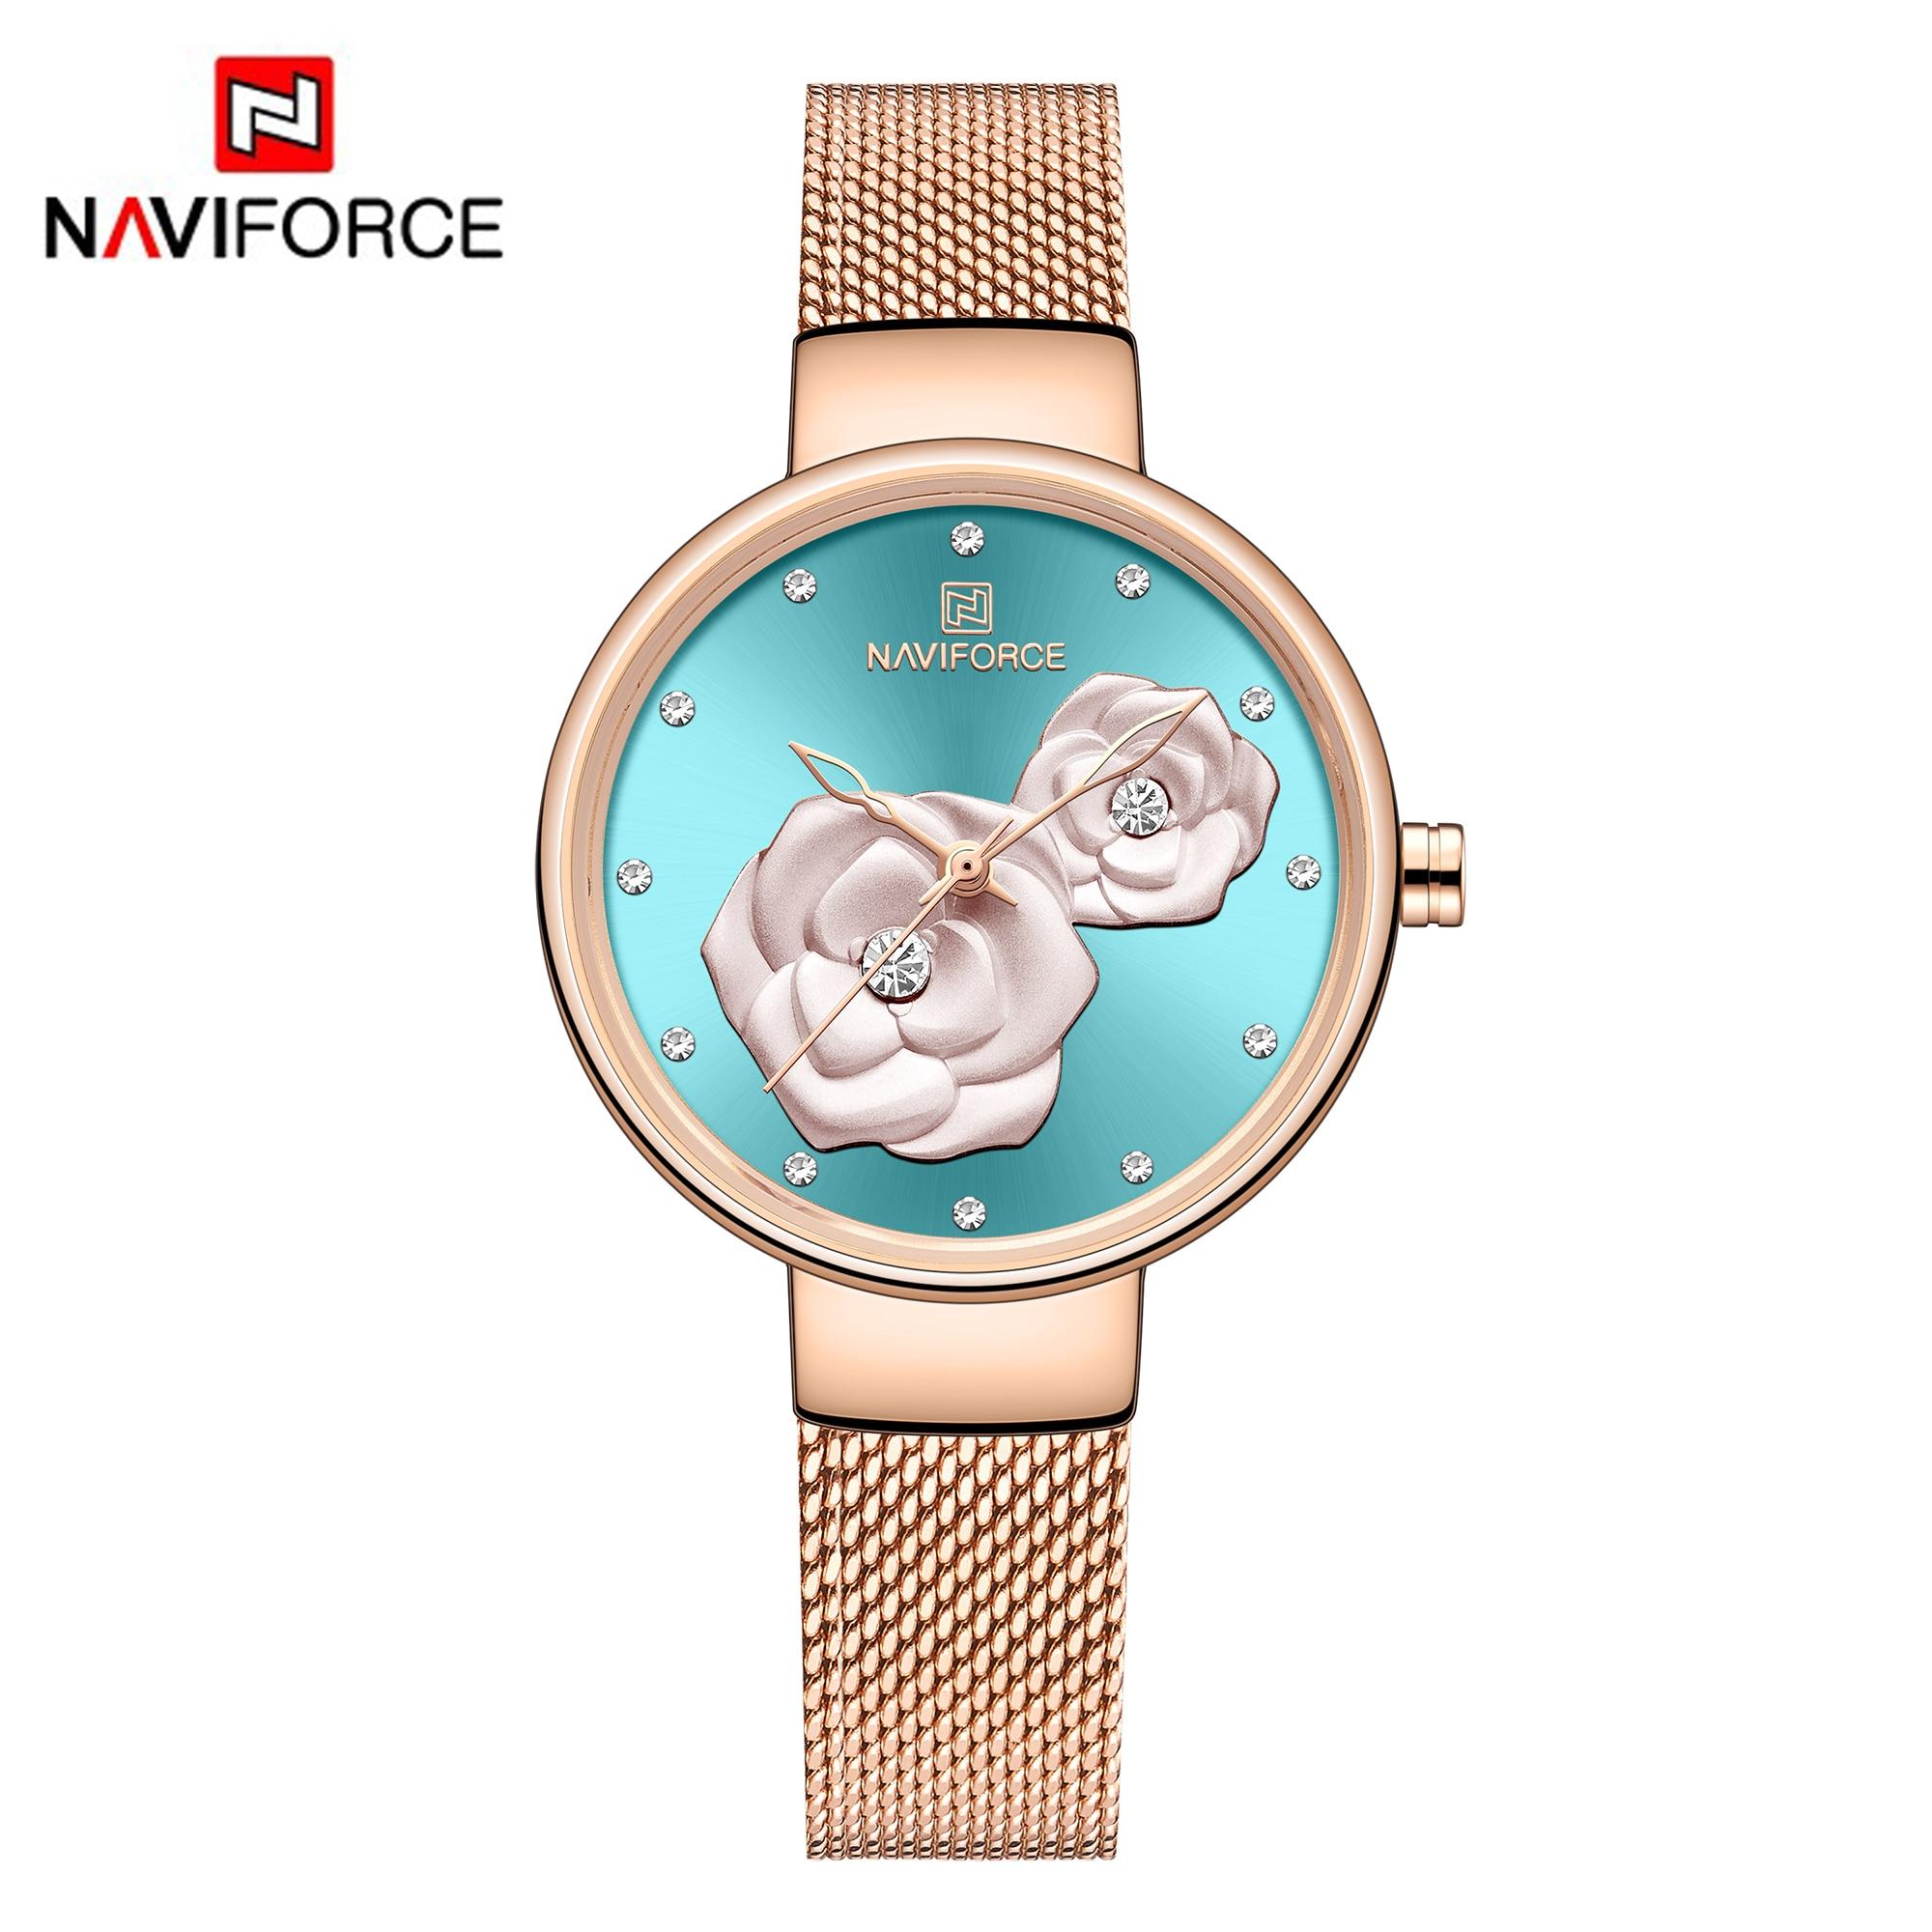 NAVIFORCE Beautiful Flower Design Watches Women Fashion Casual Crystal Wristwatch Ladies Watch Female Clock Women's Quartz Watch enlarge